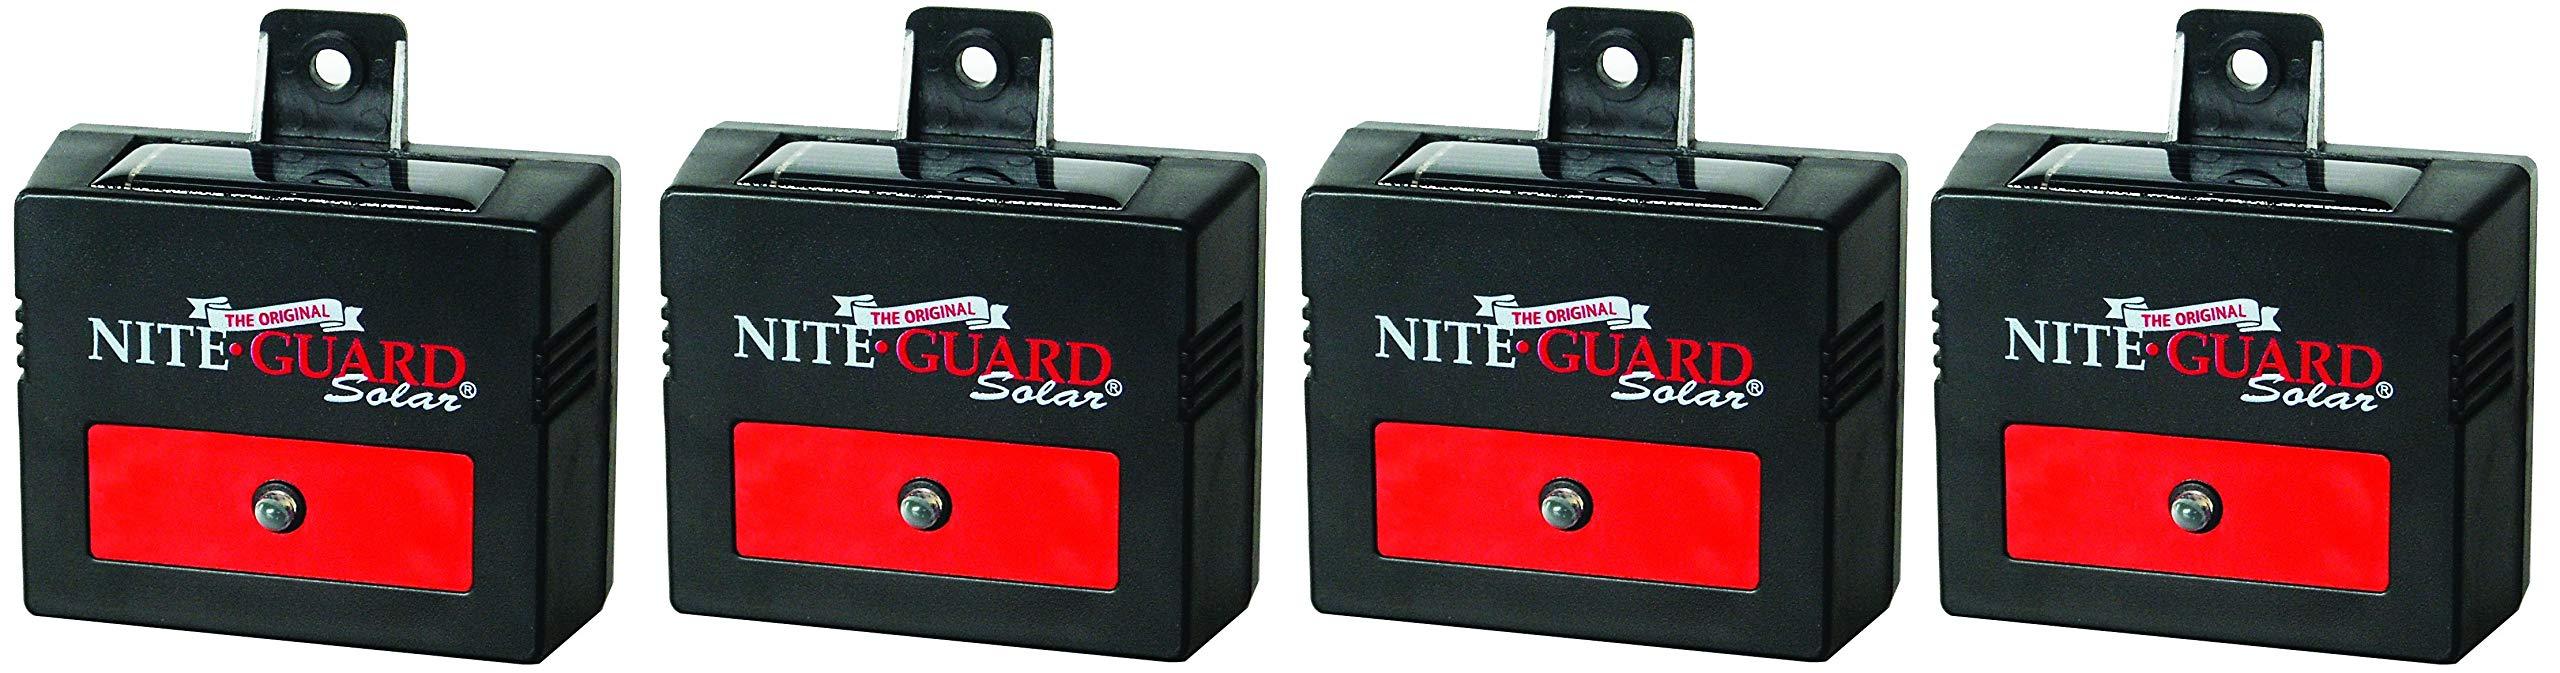 Nite Guard Solar NG-001 Predator Control Light, Single Pack (4-(Pack))